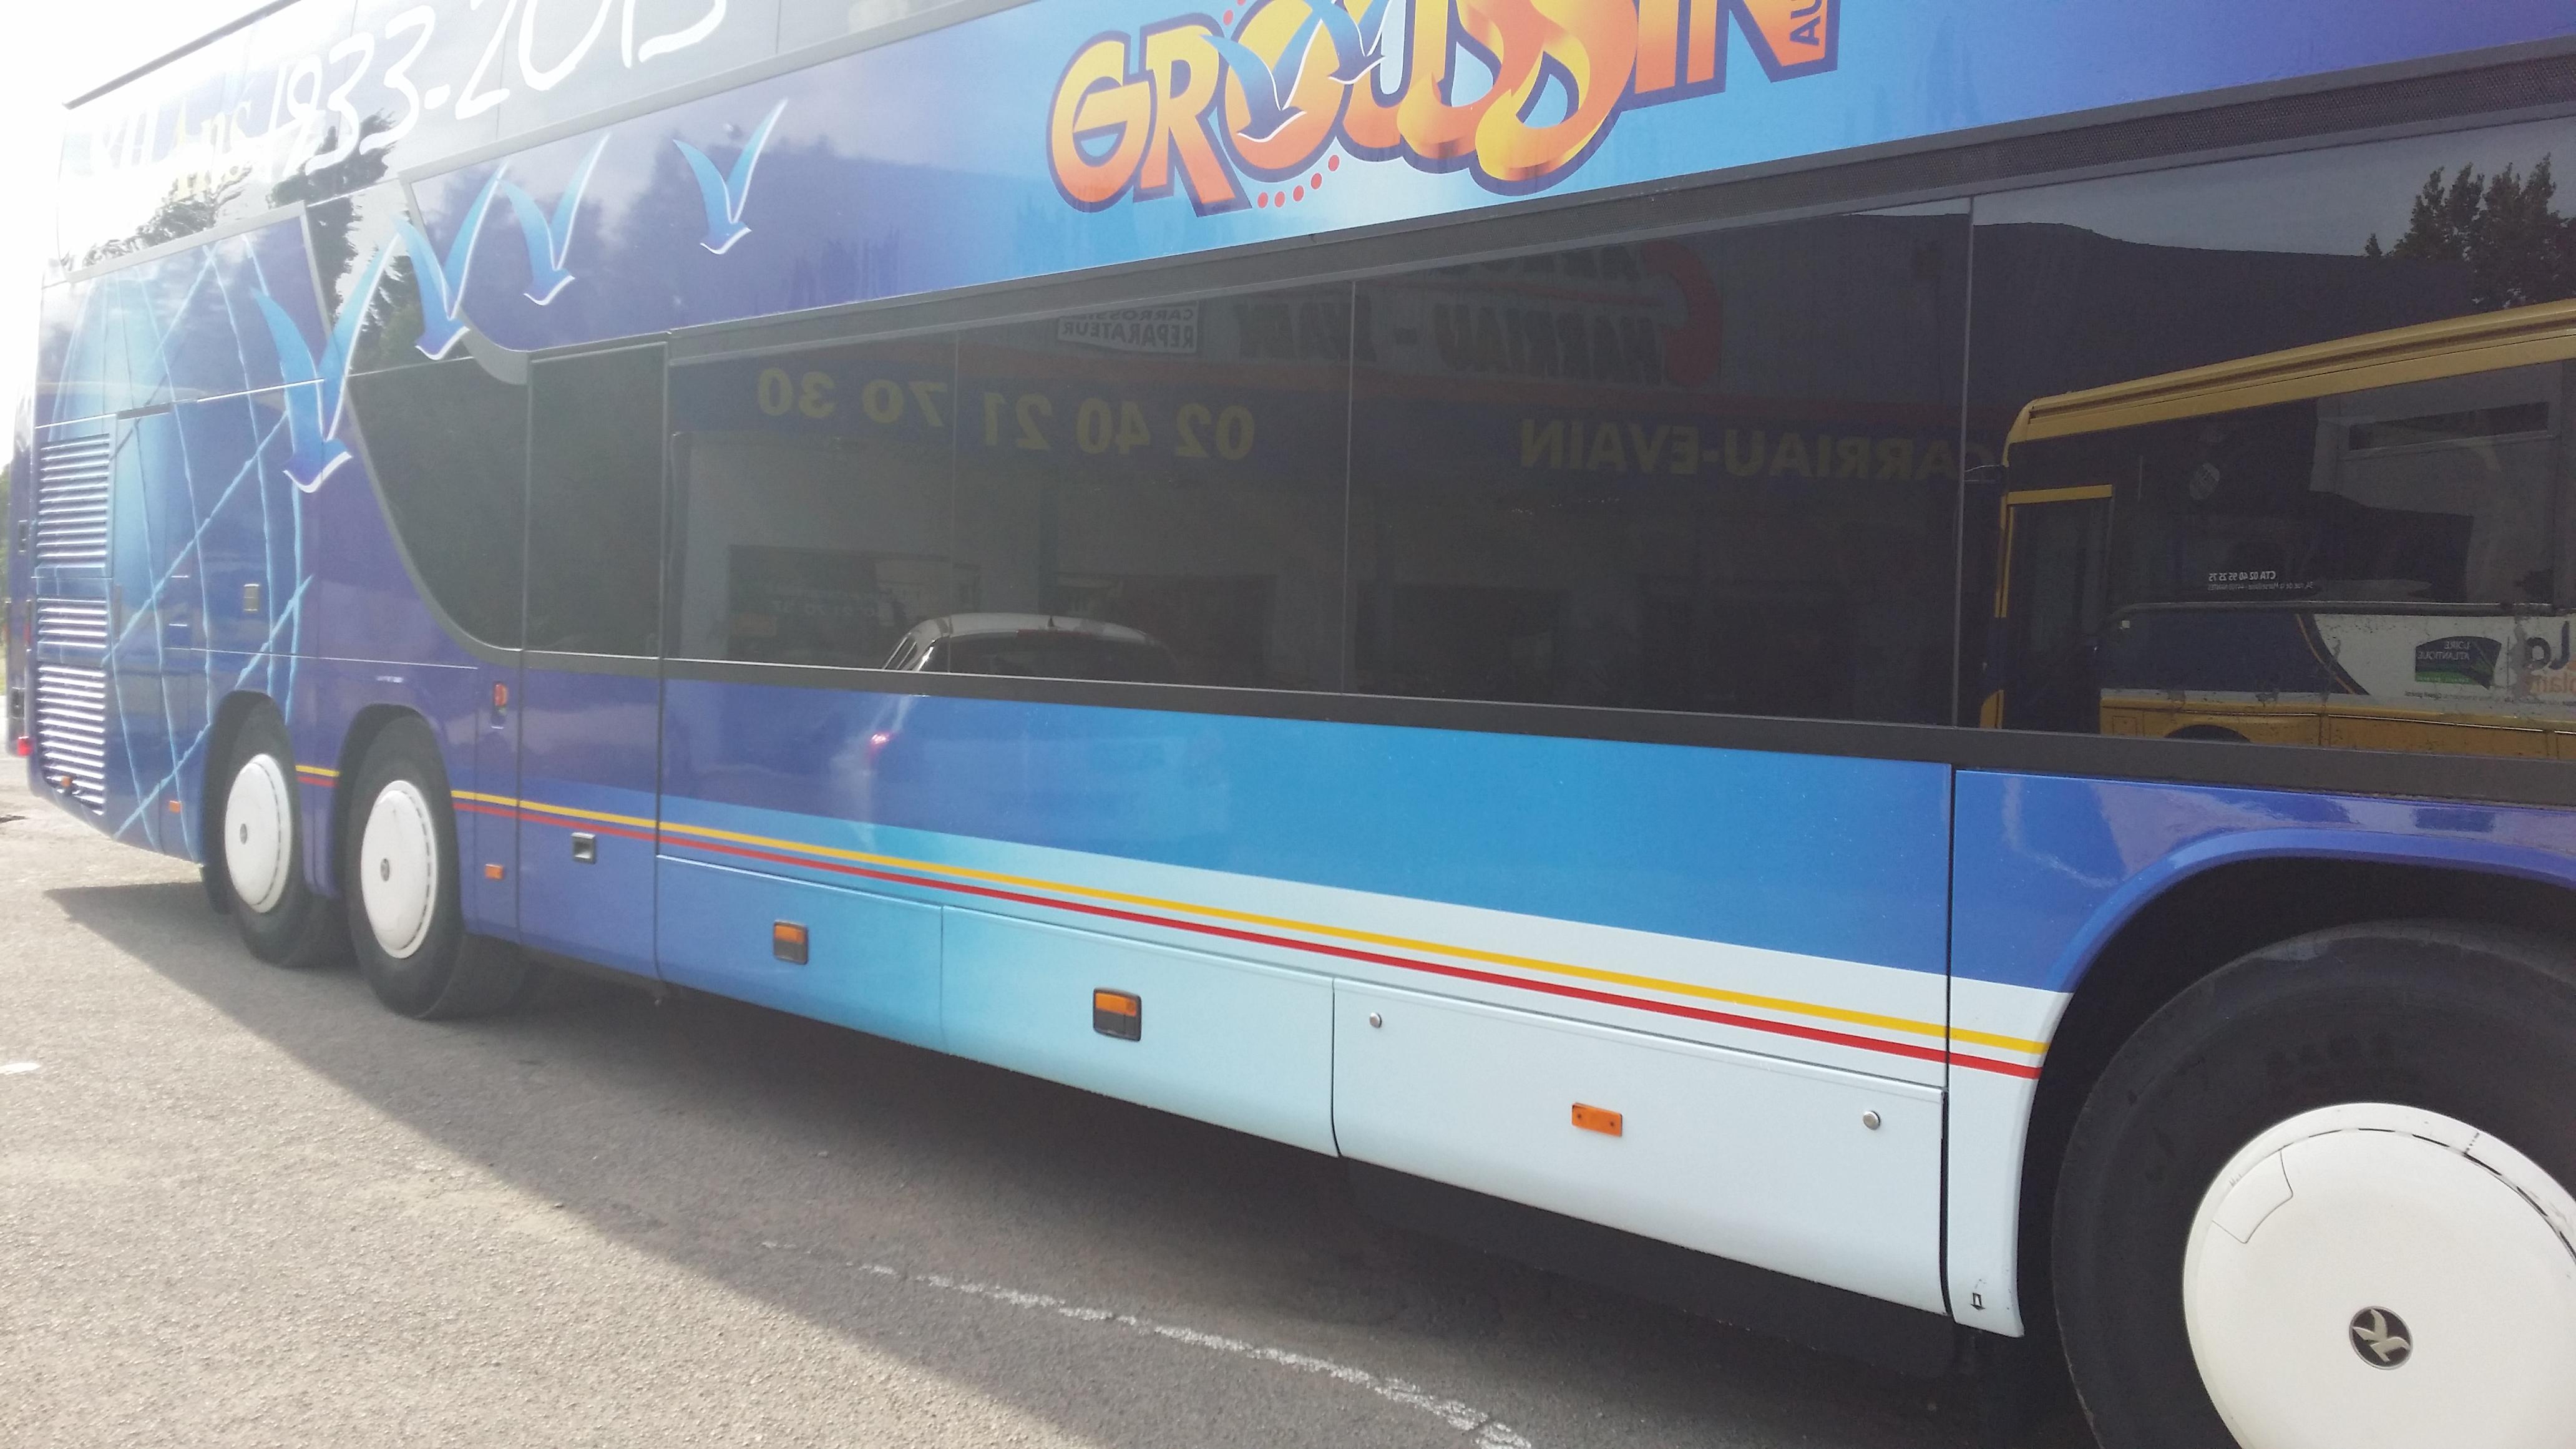 Autocars Groussin